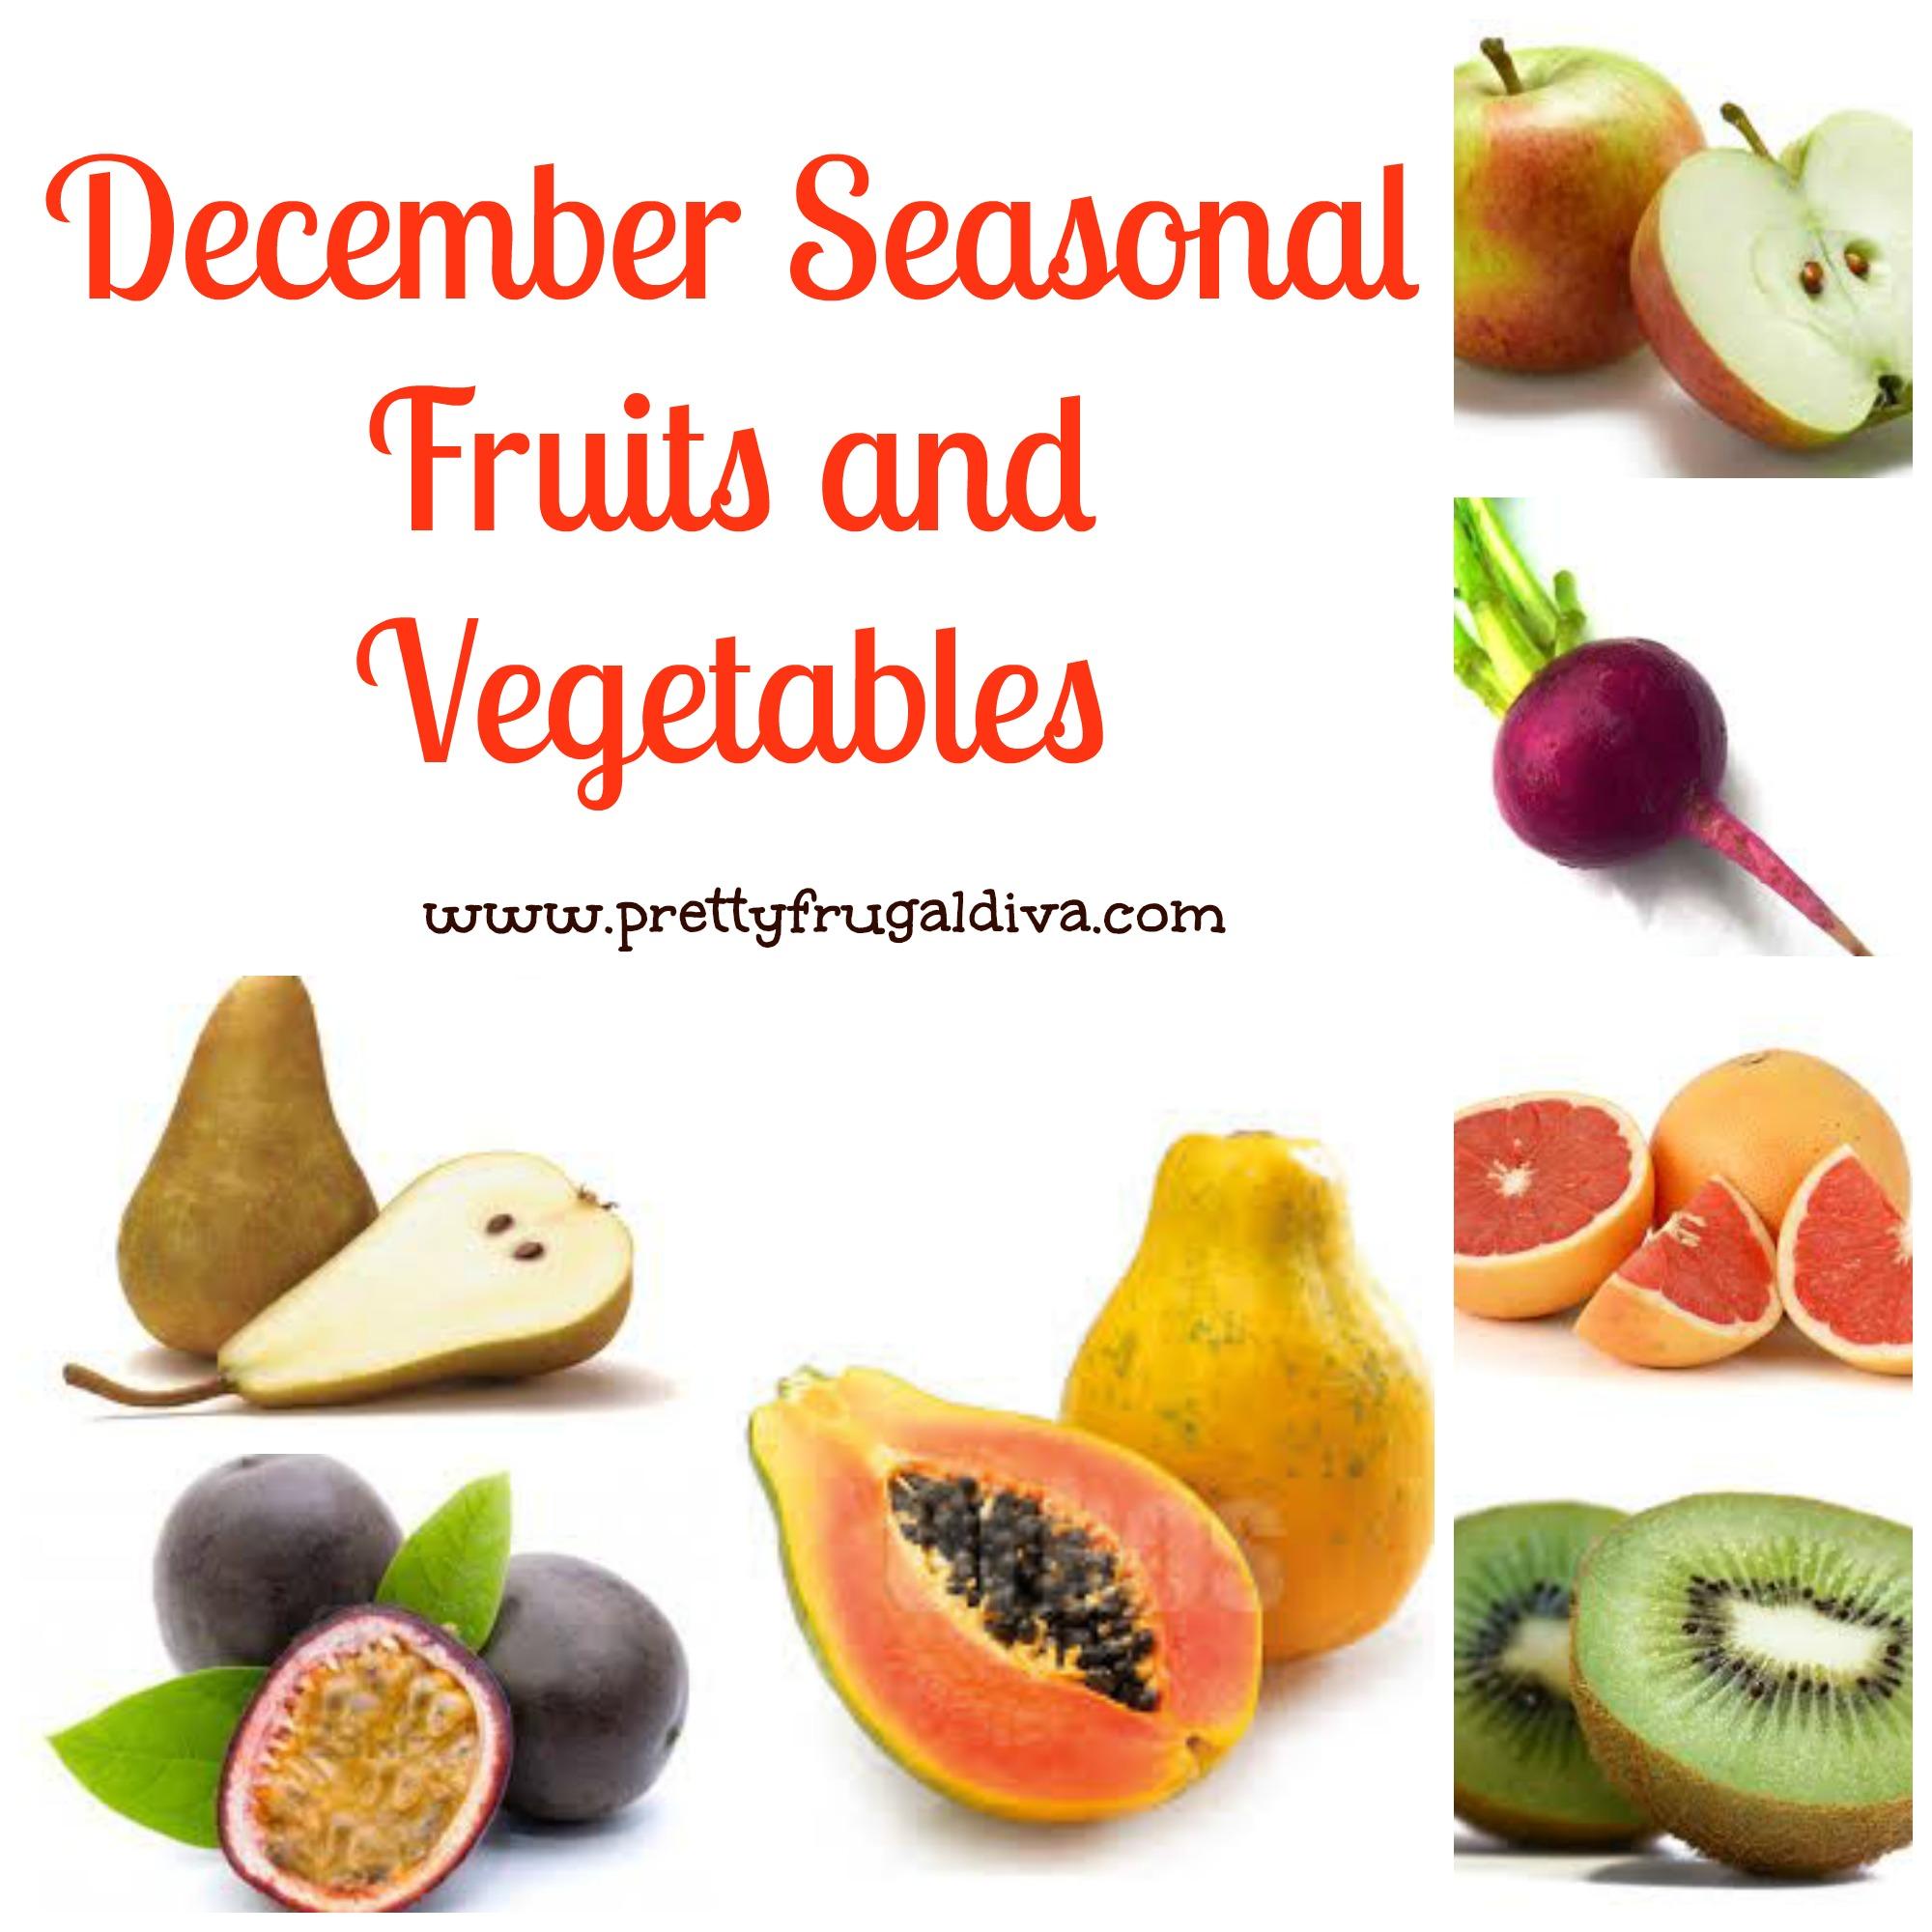 Decembers Seasonal Fruits And Vegetables Pretty Frugal Diva